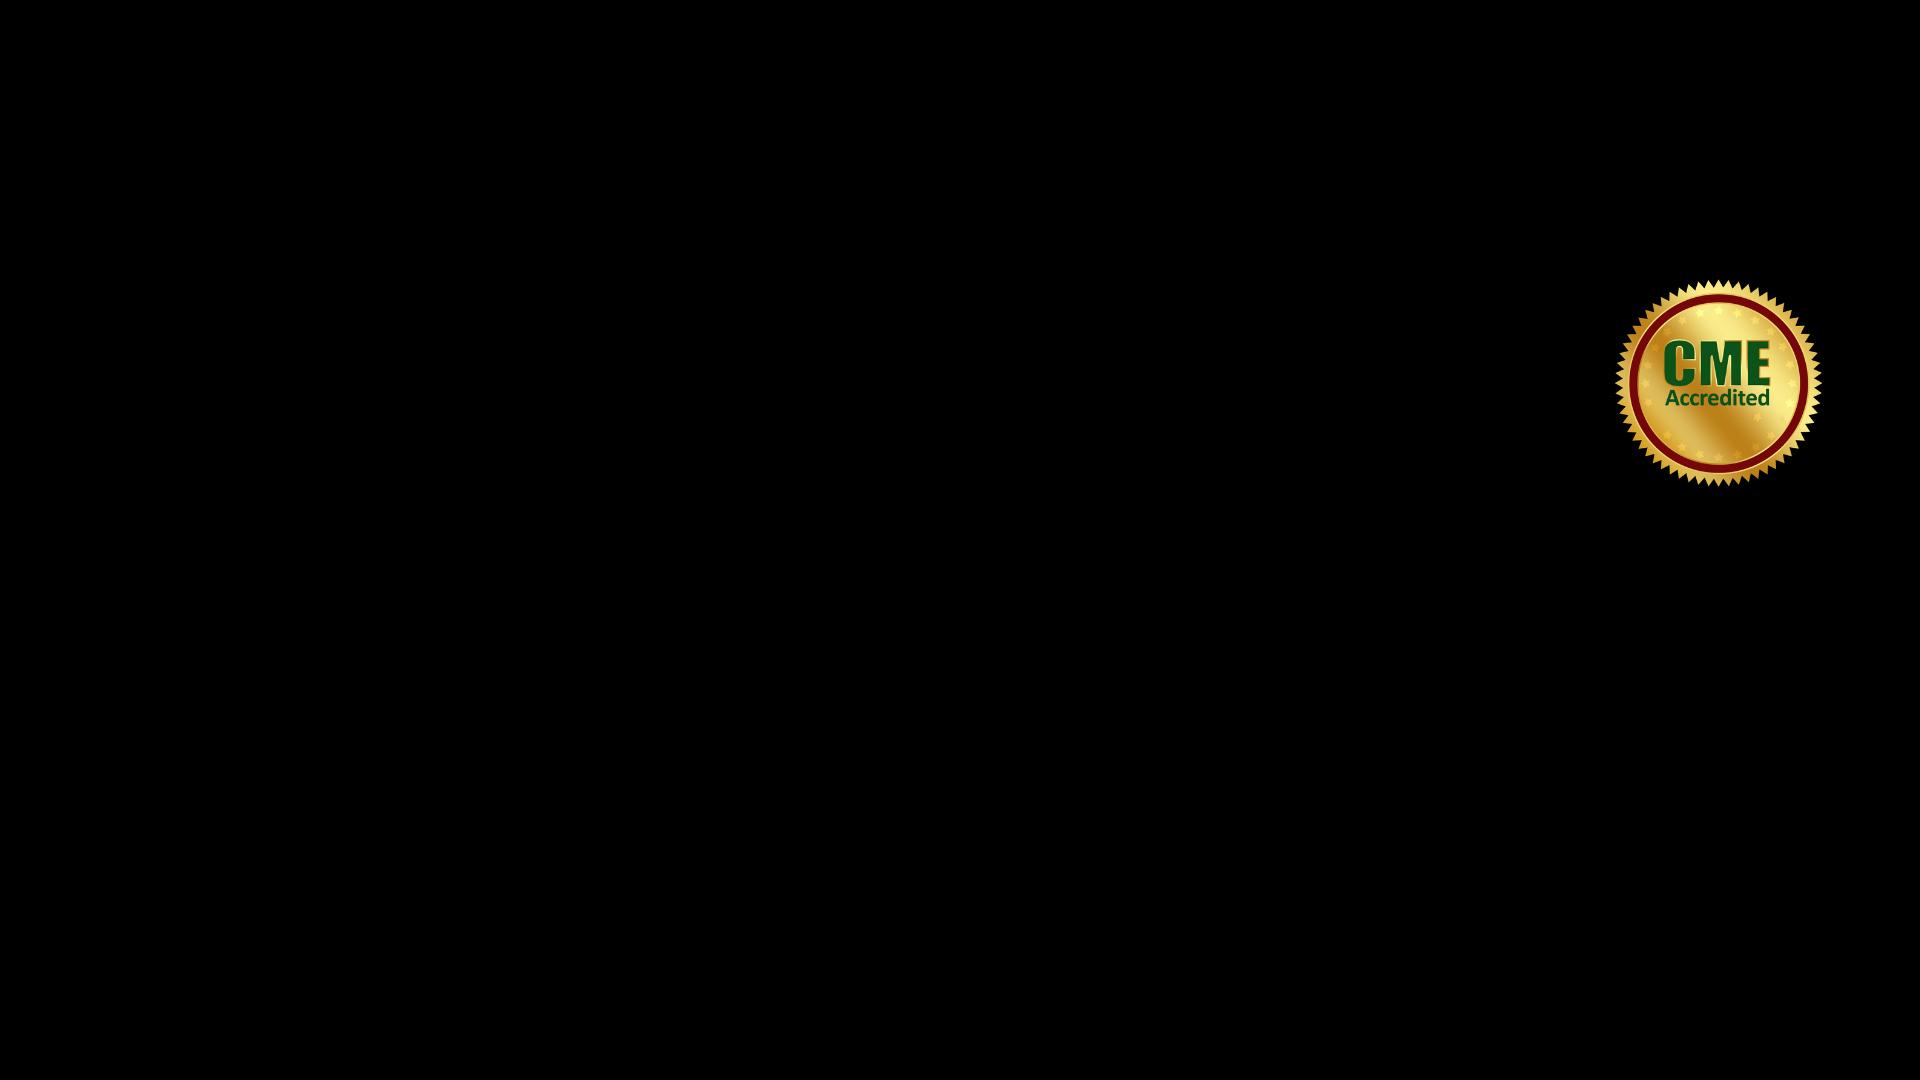 img-4